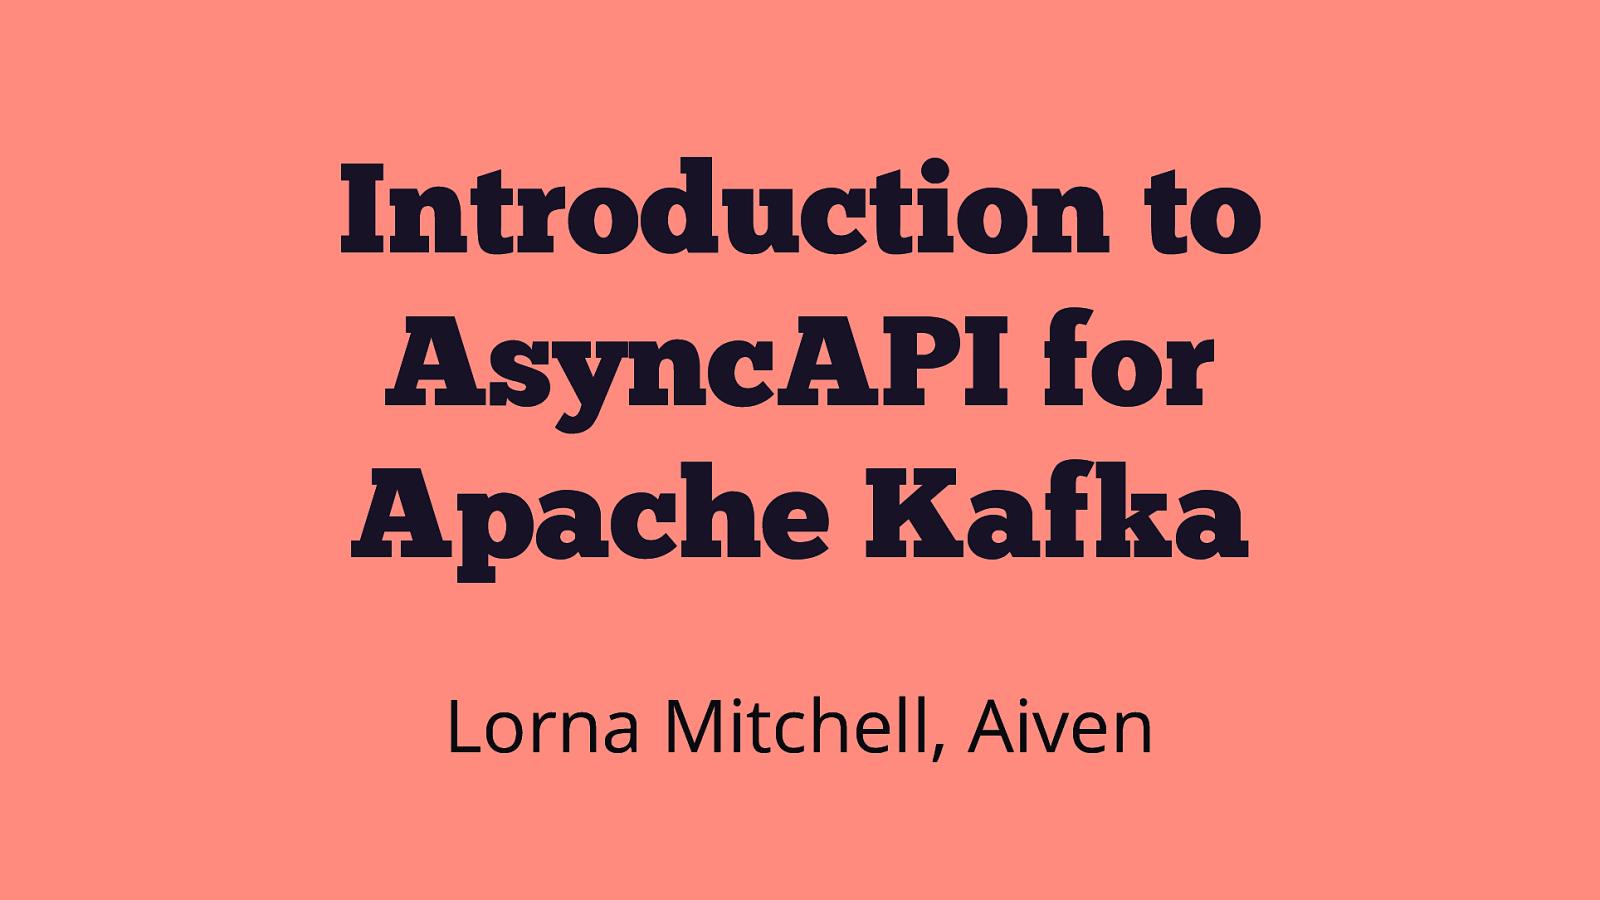 Introduction to AsyncAPI for Apache Kafka